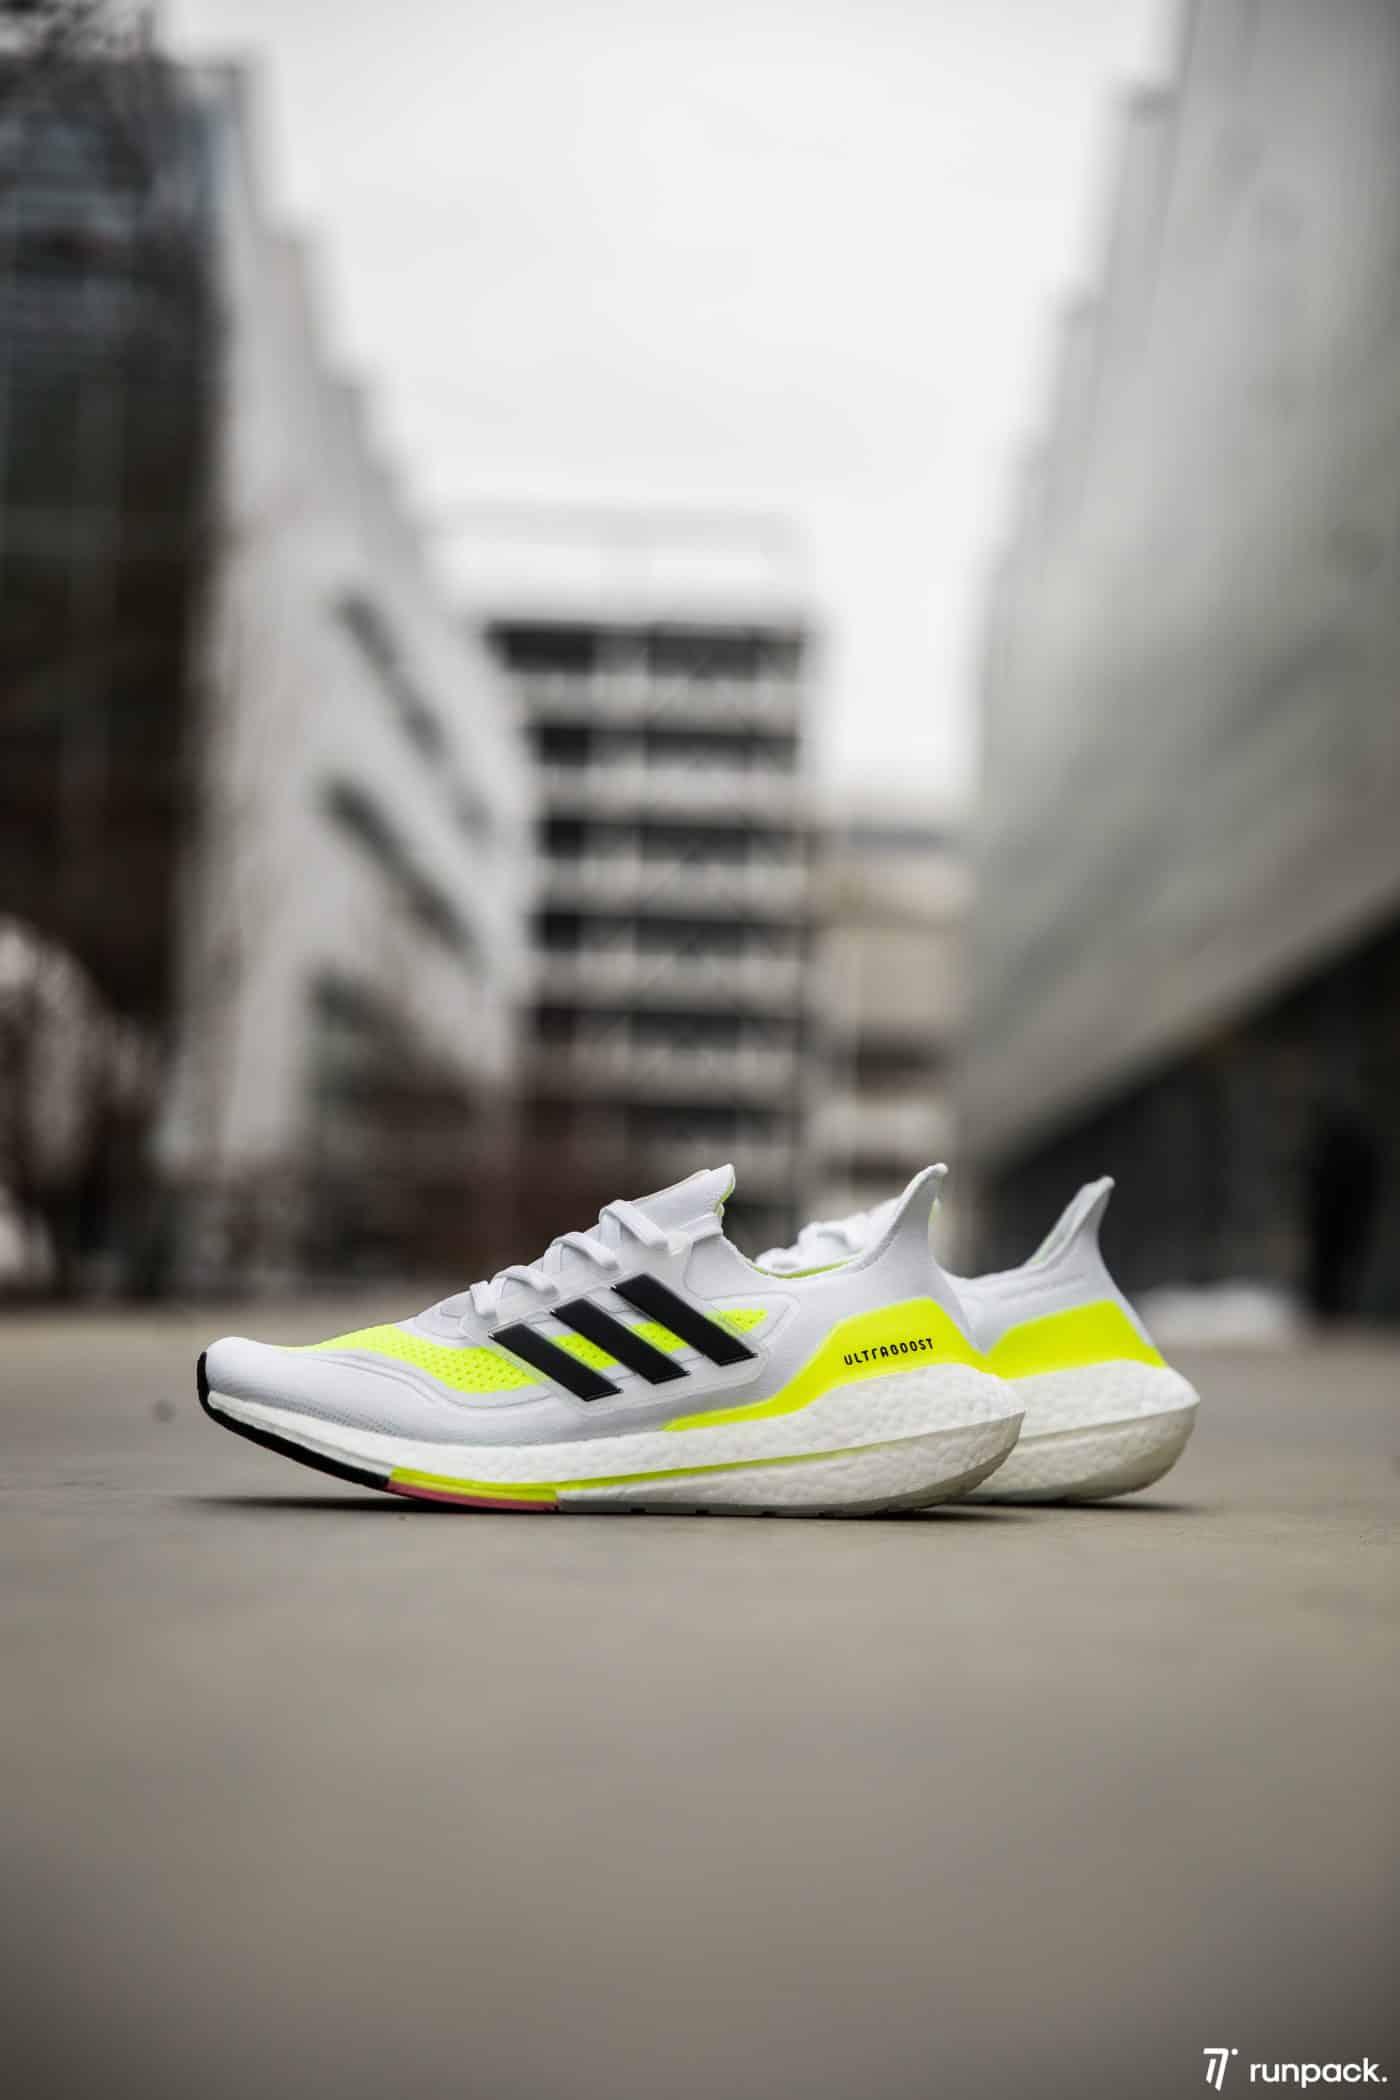 runpack_adidas_ultraboost-21_17